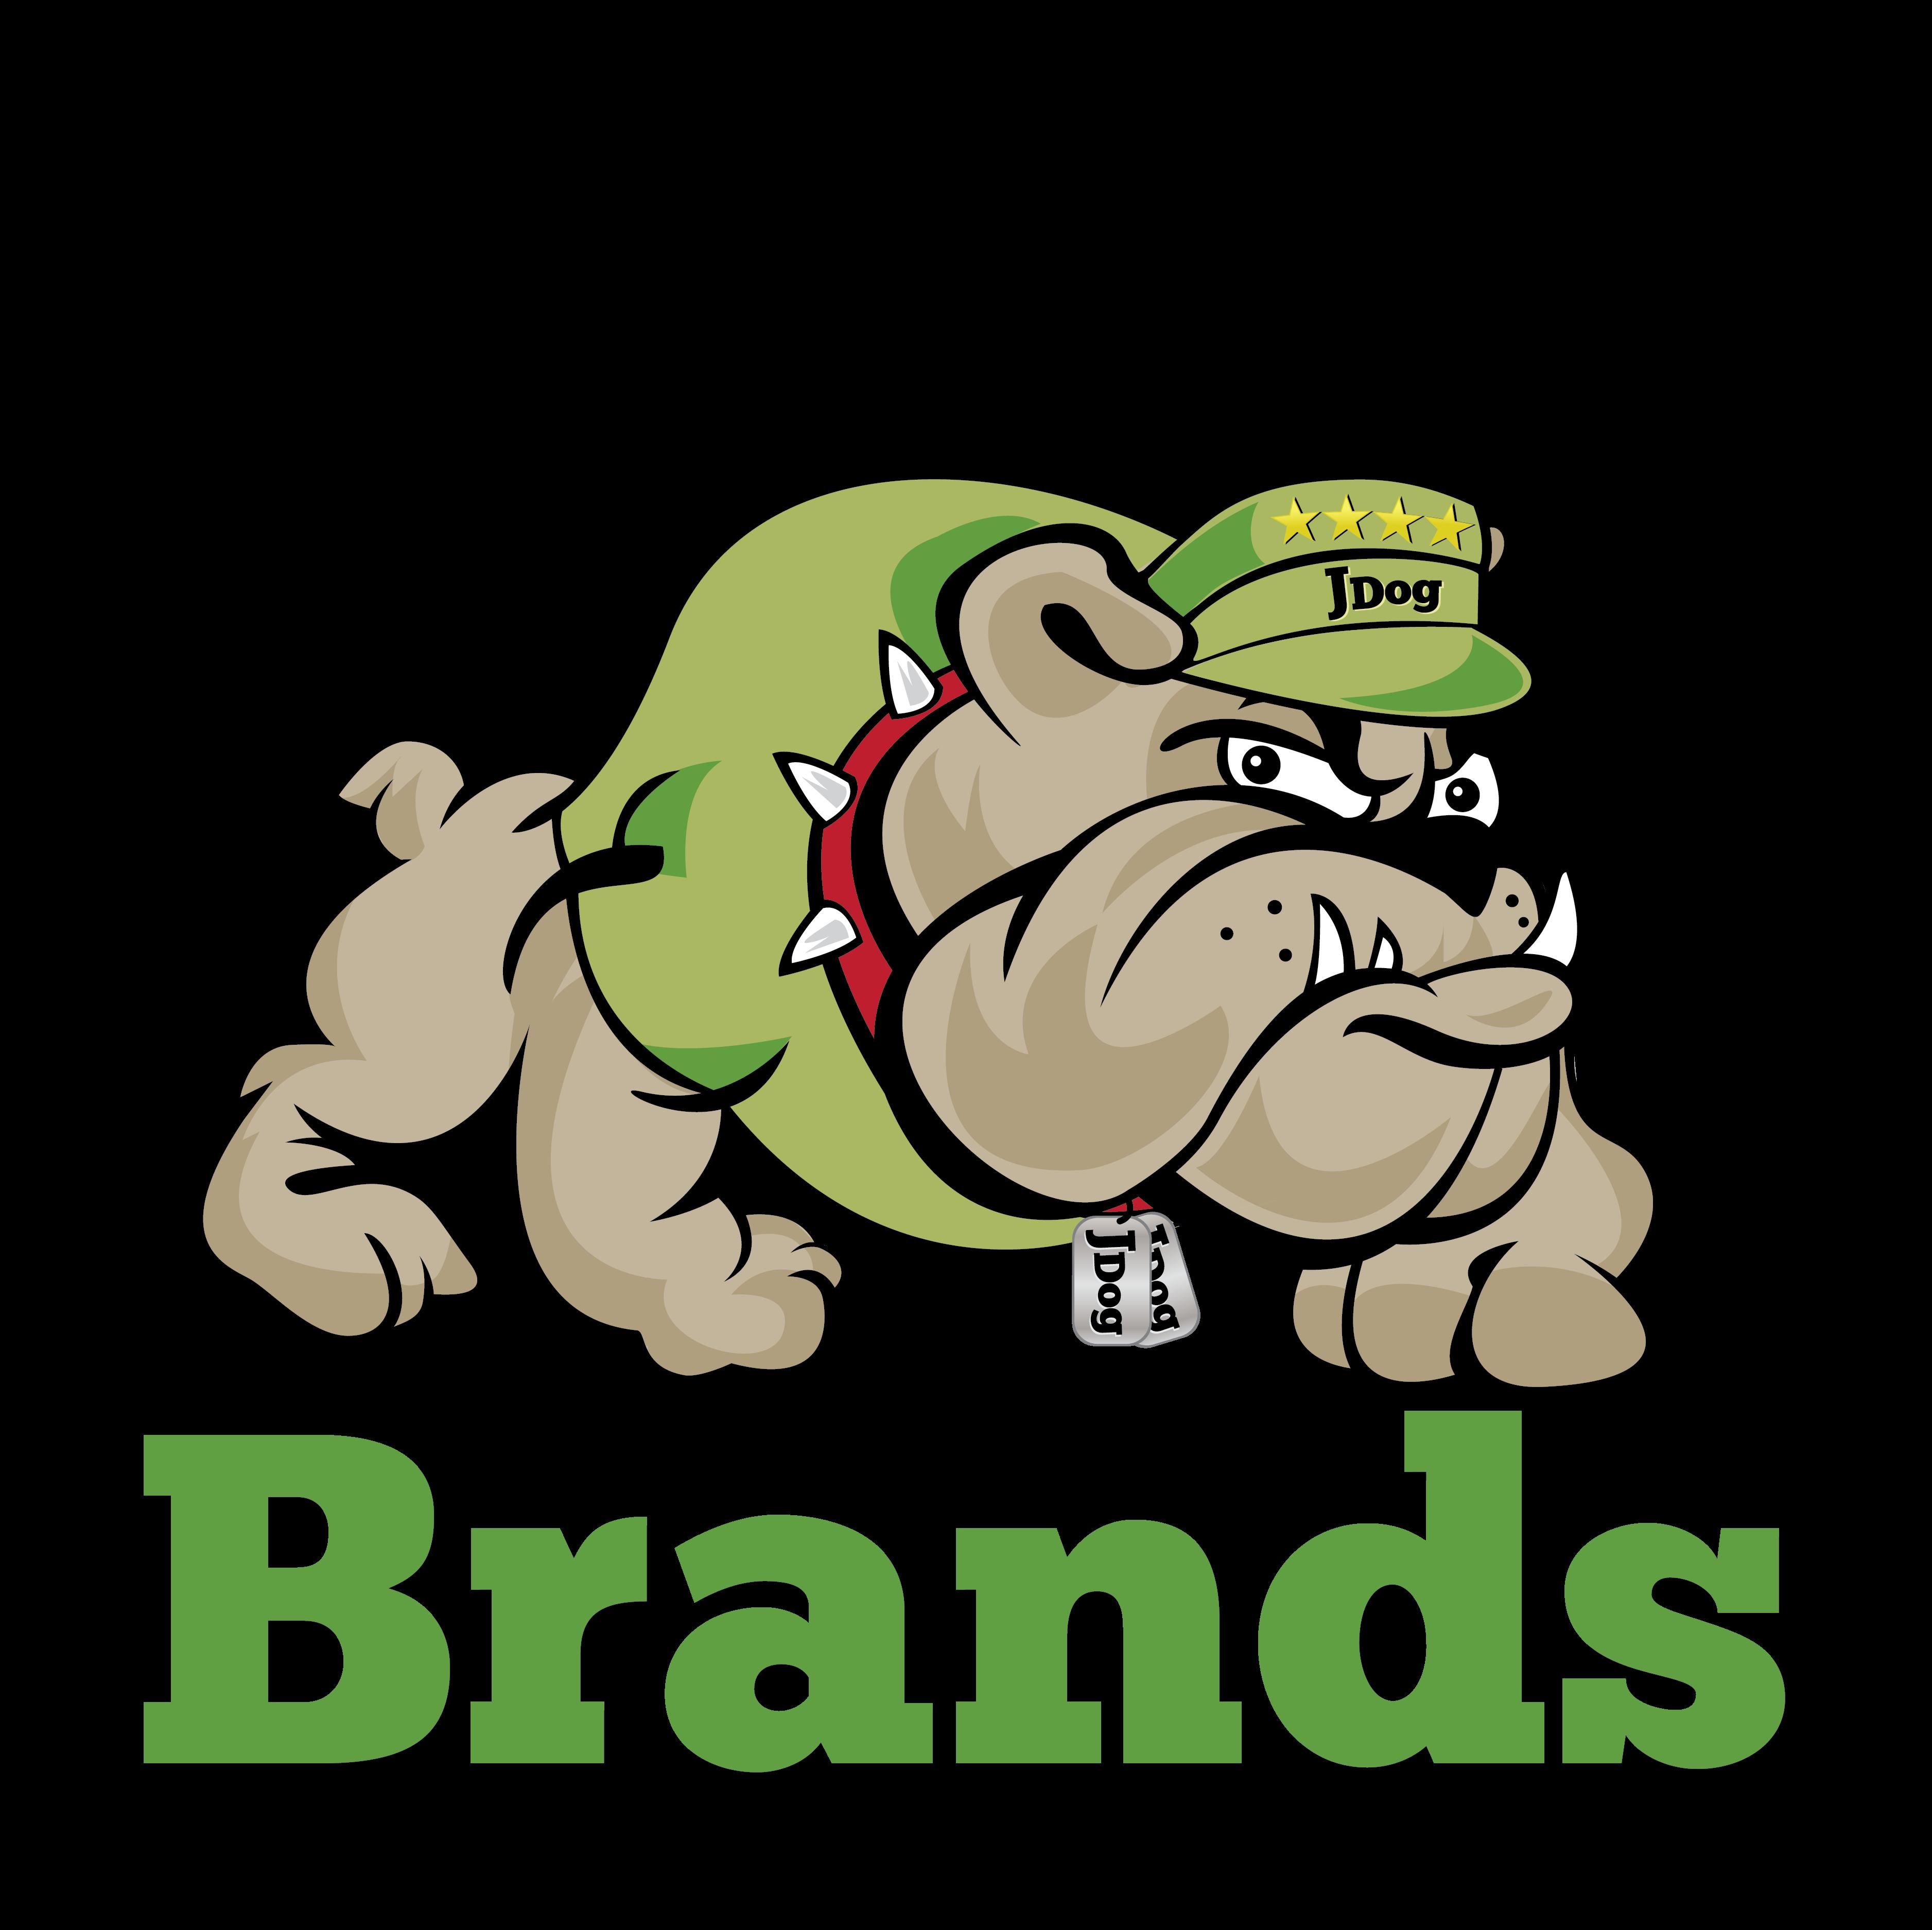 JDog Brands logo